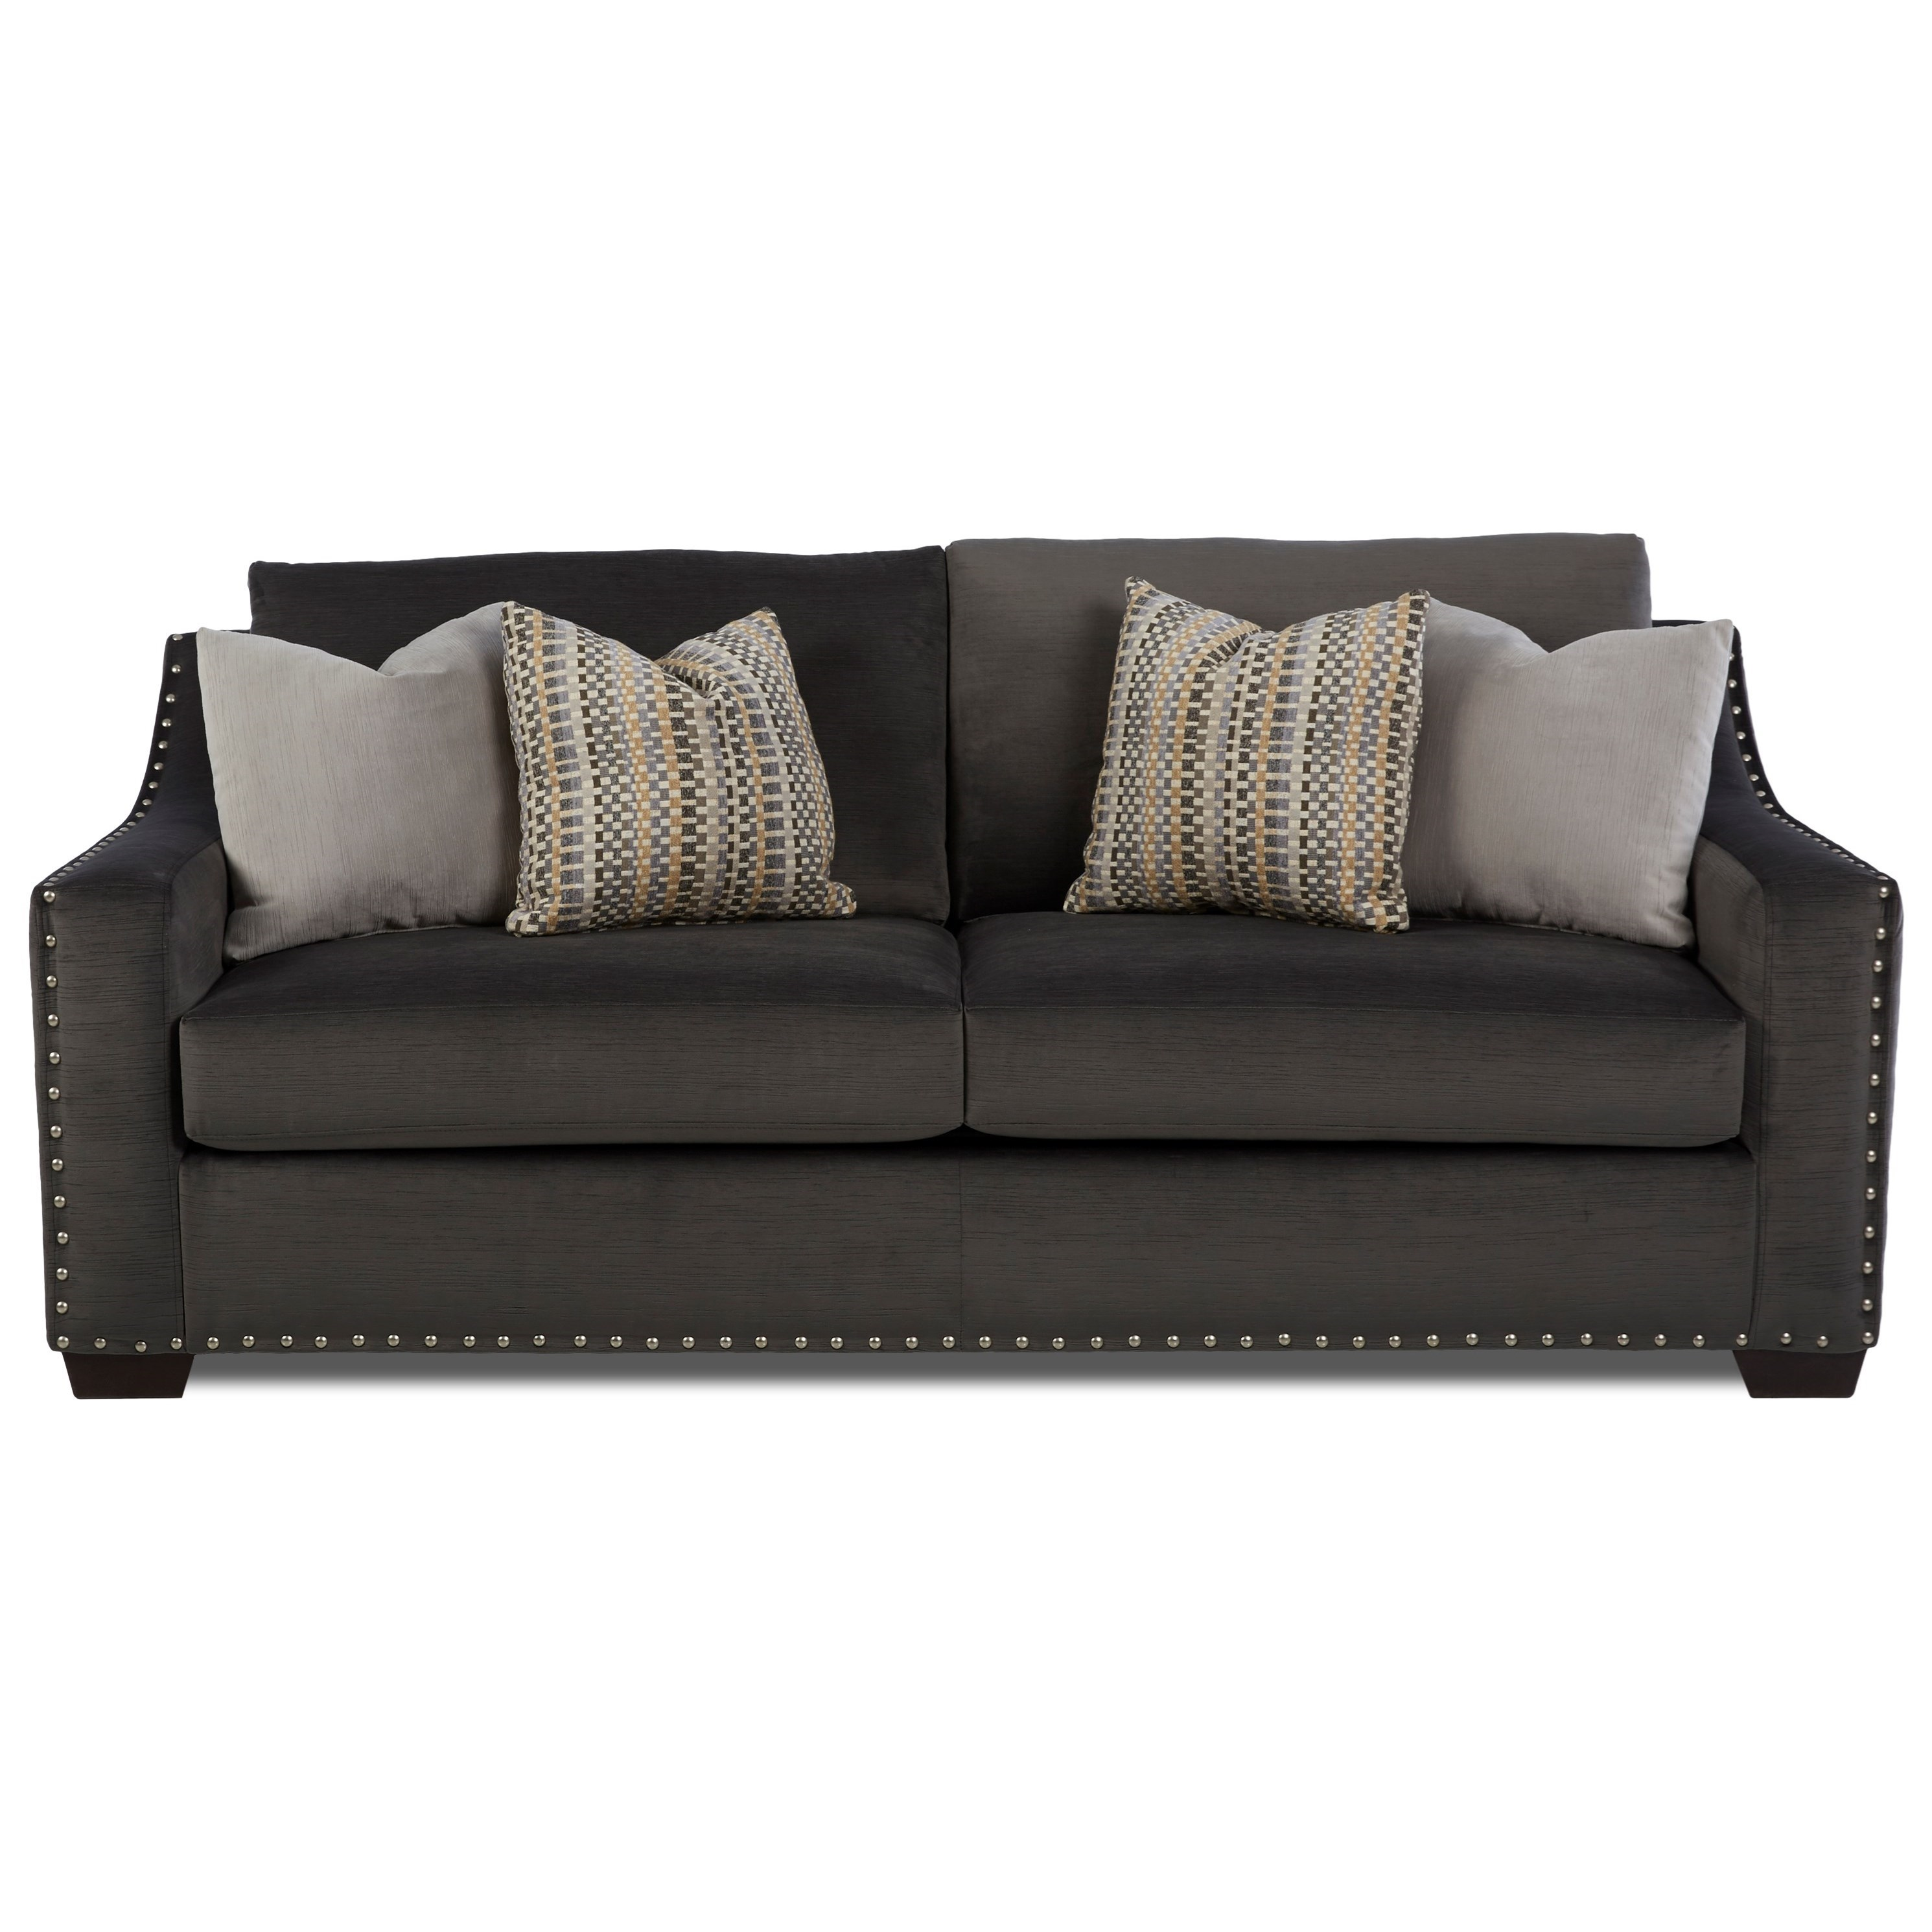 cheap sofas uk argos bargain corner sofa grey brooklyn settee from rrp 399 in